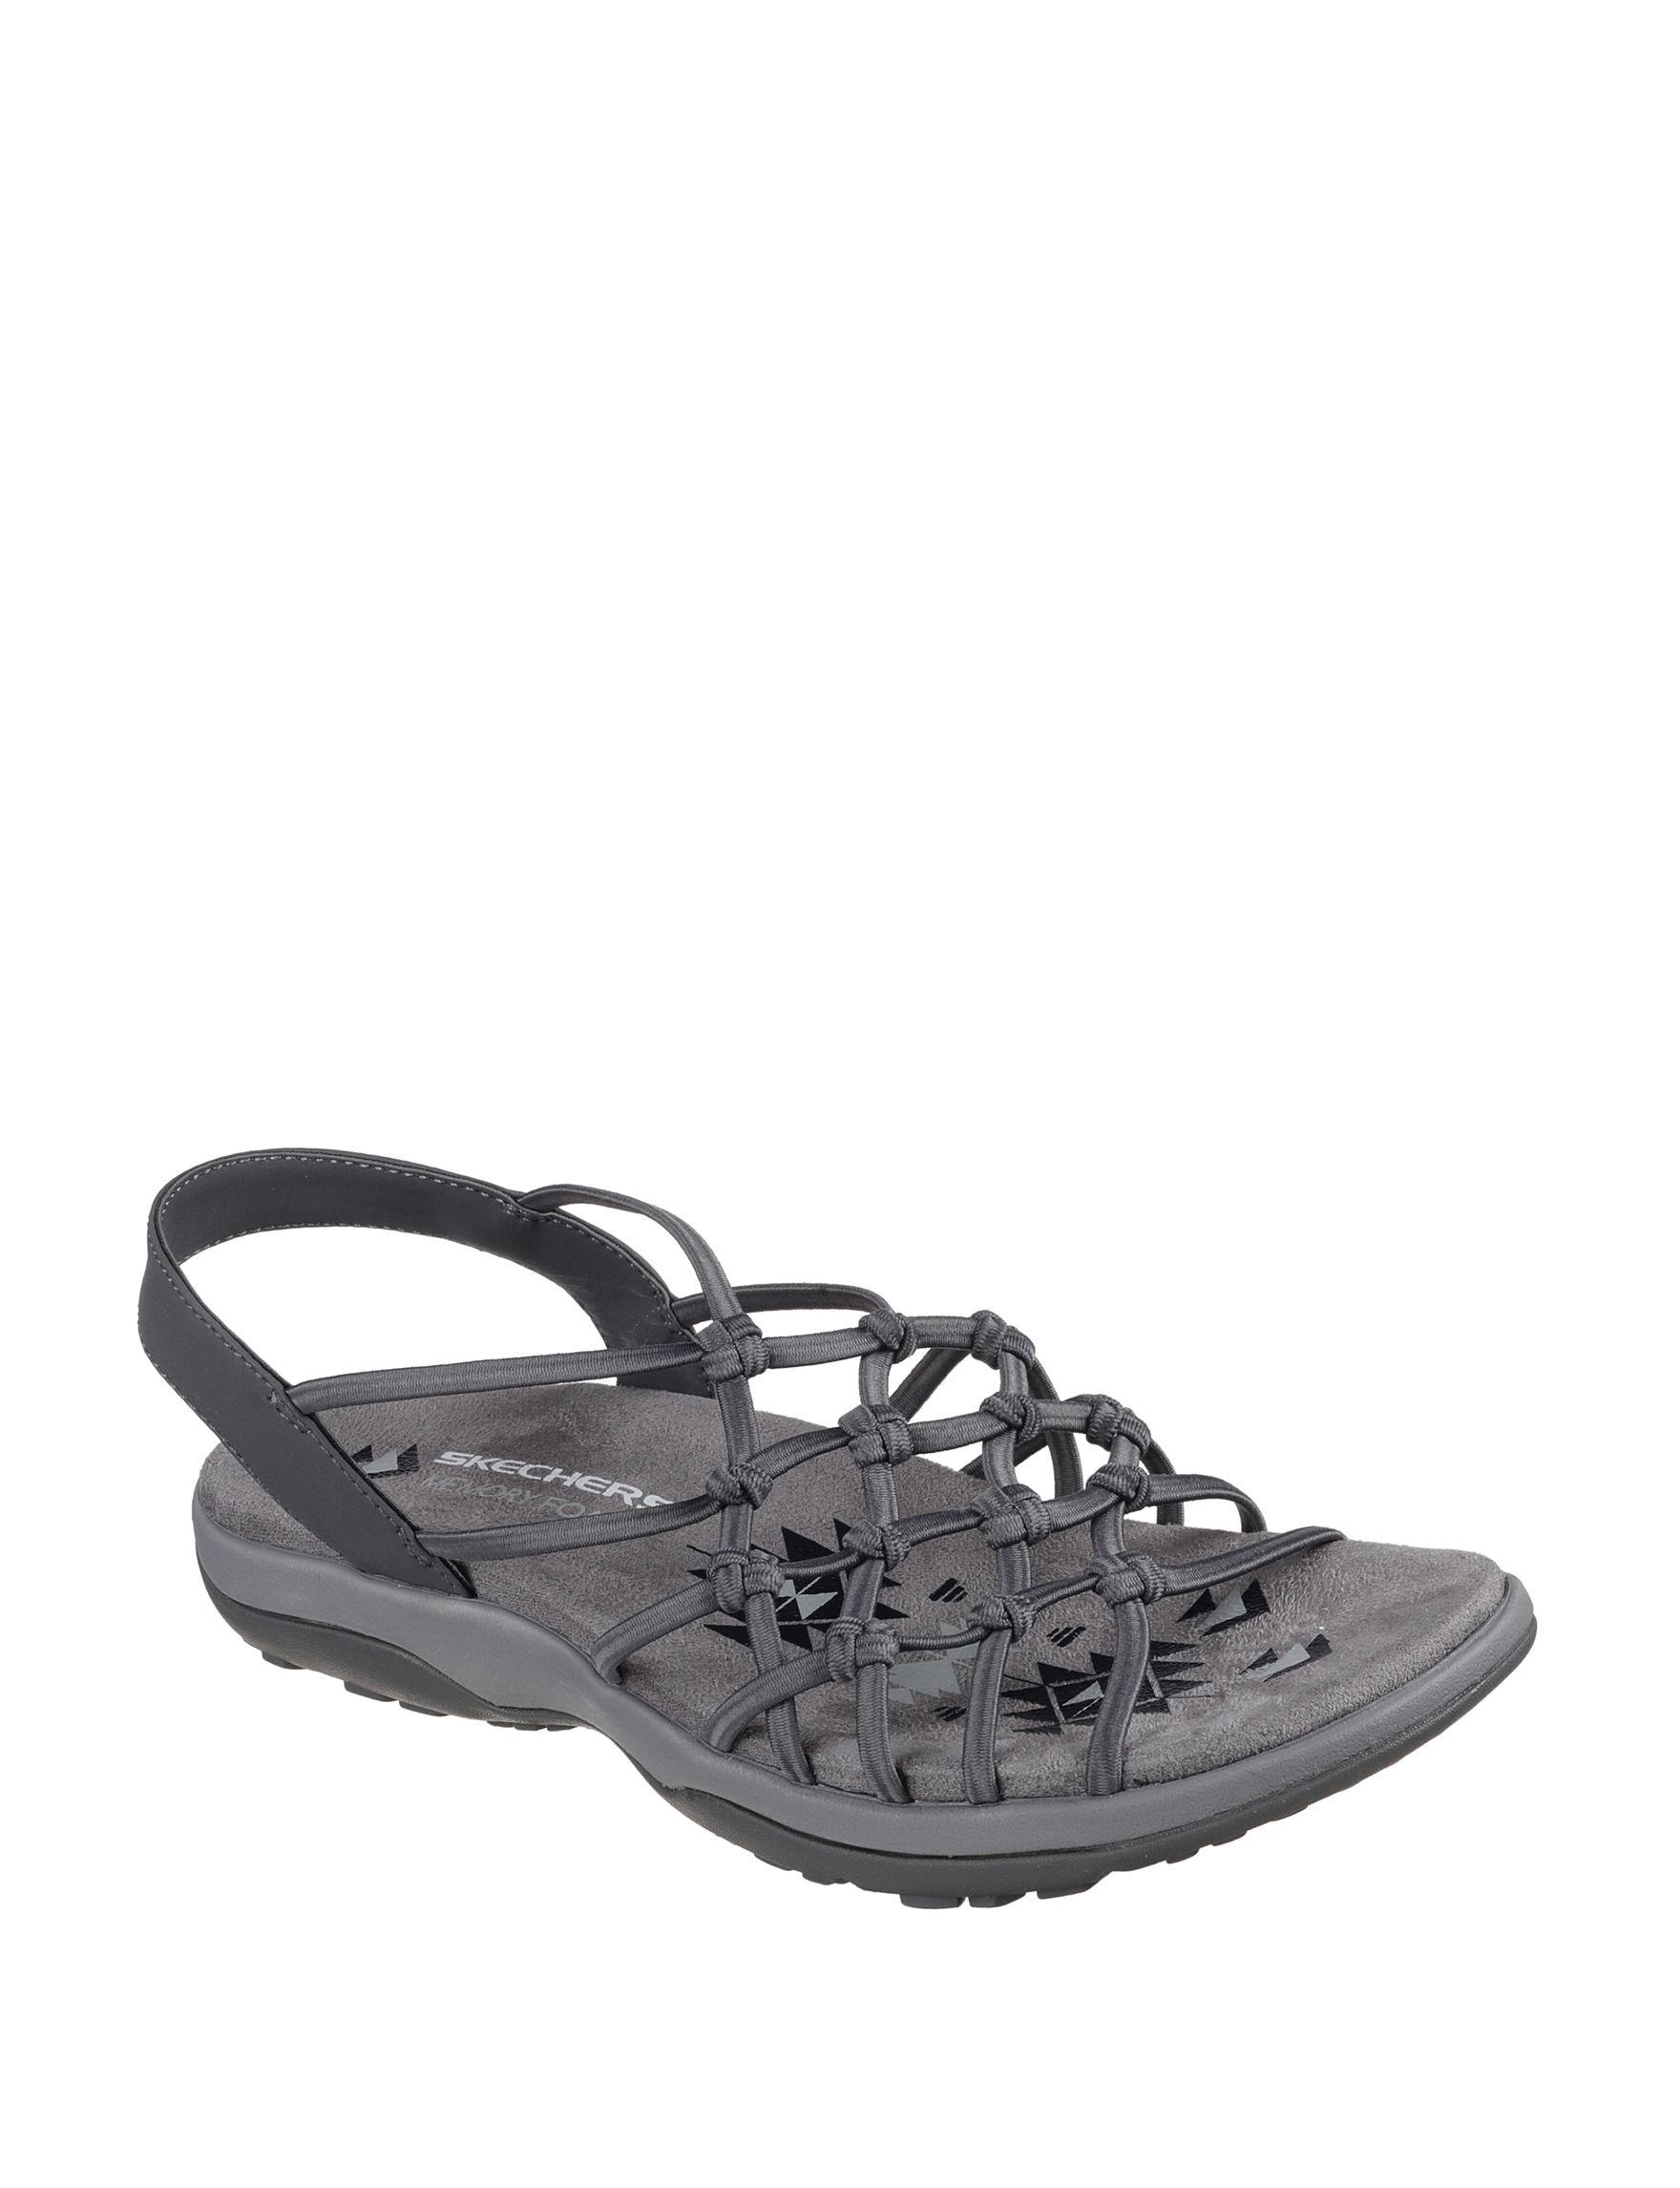 c630cce813ad Skechers Women s Reggae Slim Forget Me Knot Sport Sandals